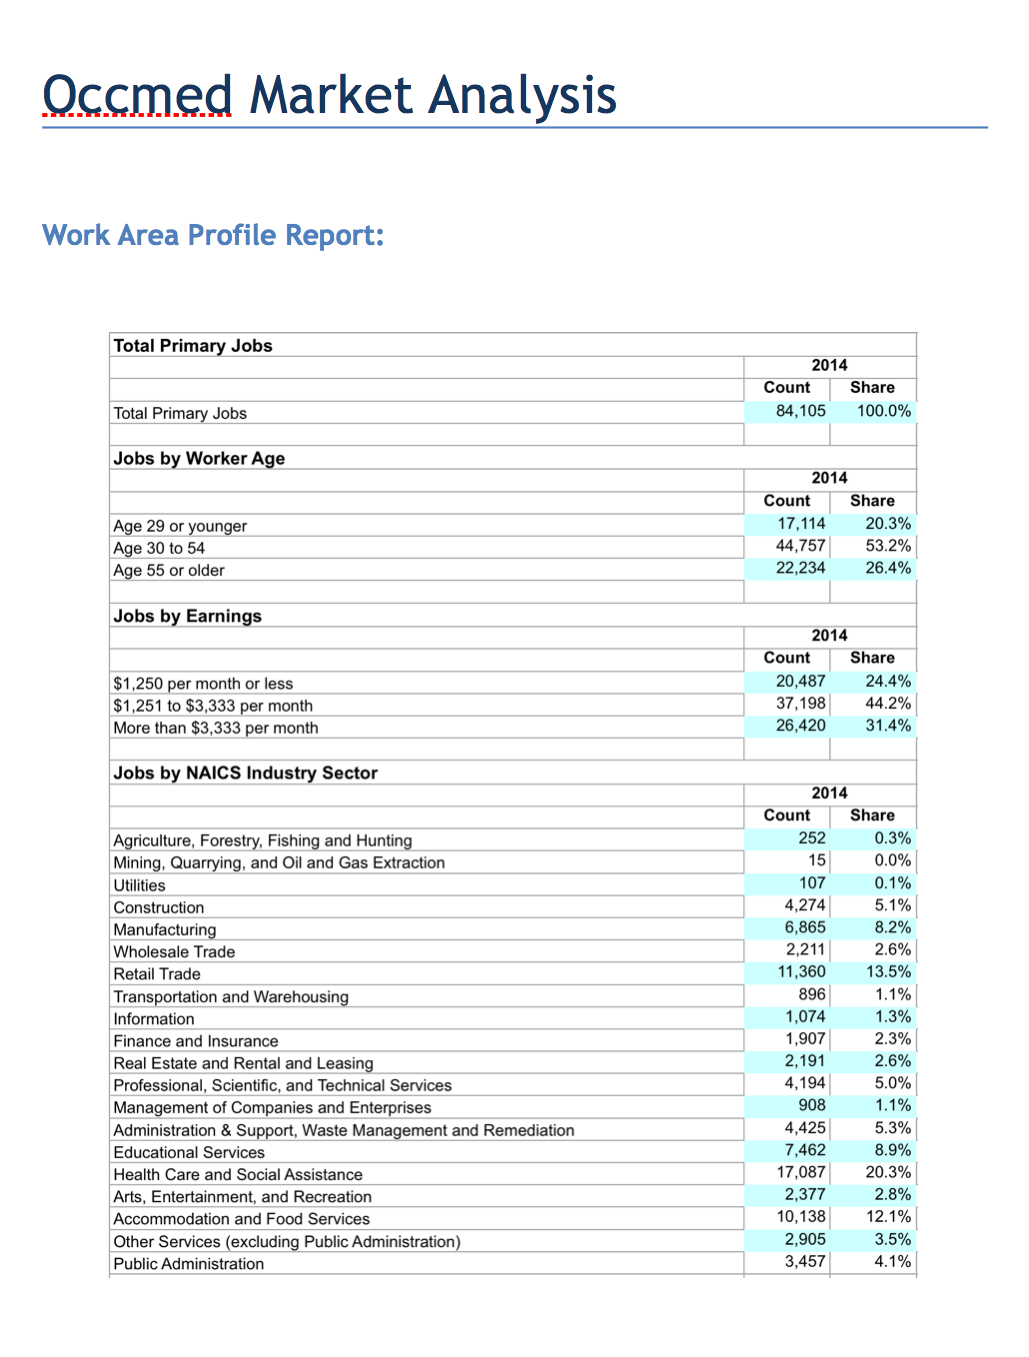 Occupational Medicine market analysis